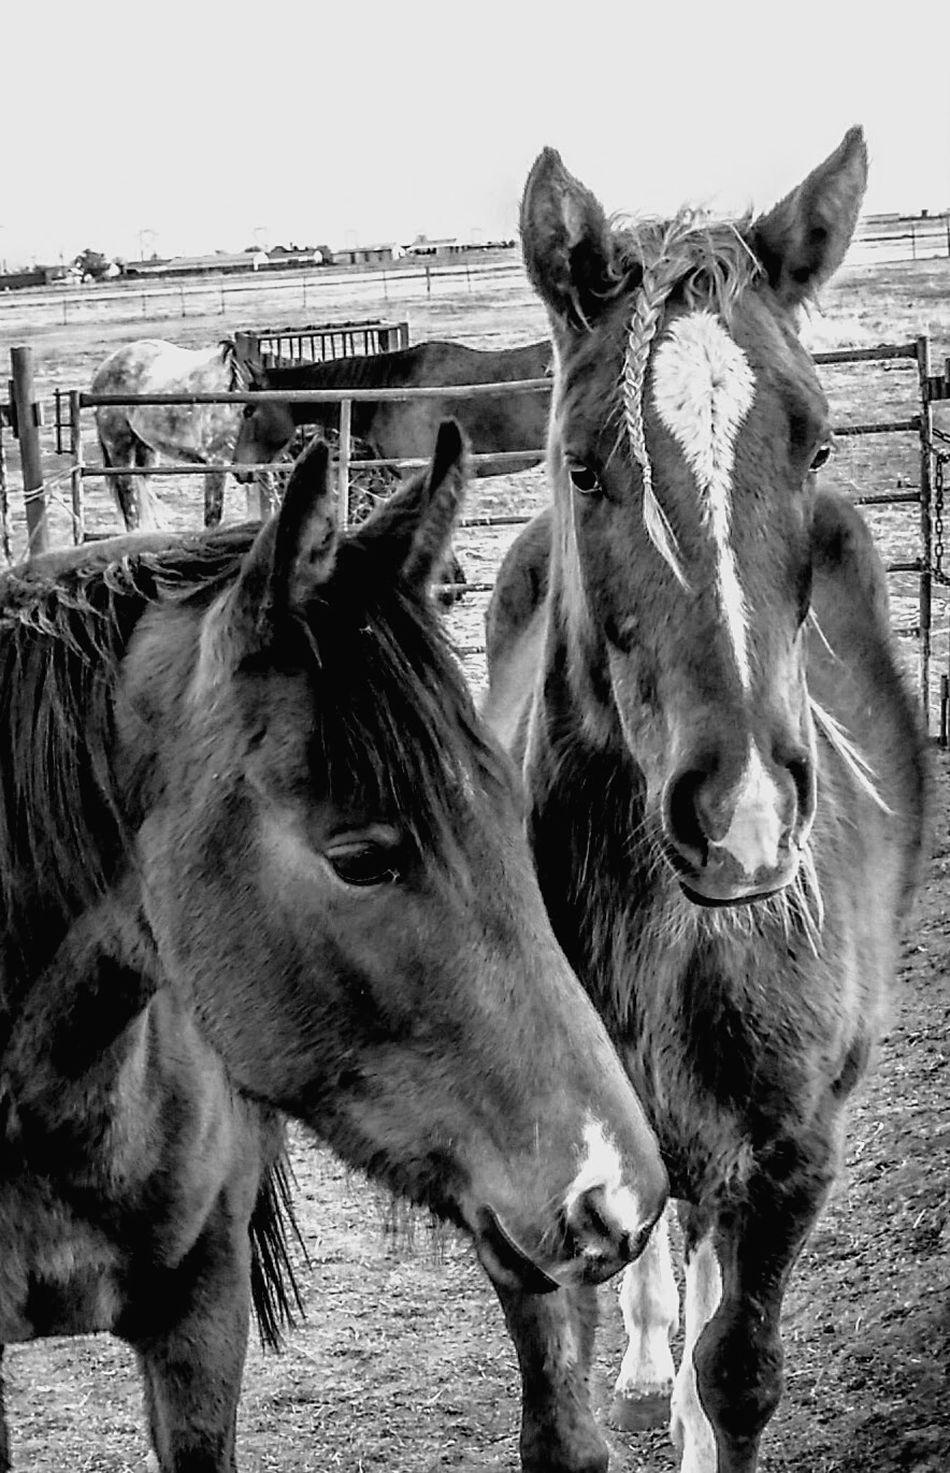 Ranch horses Horse Animal Themes Domestic Animals Mammal Livestock No People Nature Ranch Ranch Life Barn Mane Farm Cowboy Stable Livestock Country Living Sunlight Lifestyle Pasture, Paddock, Grassland, Pastureland Working Animal Pony Filly Country Life Paddock Hoofed Mammal